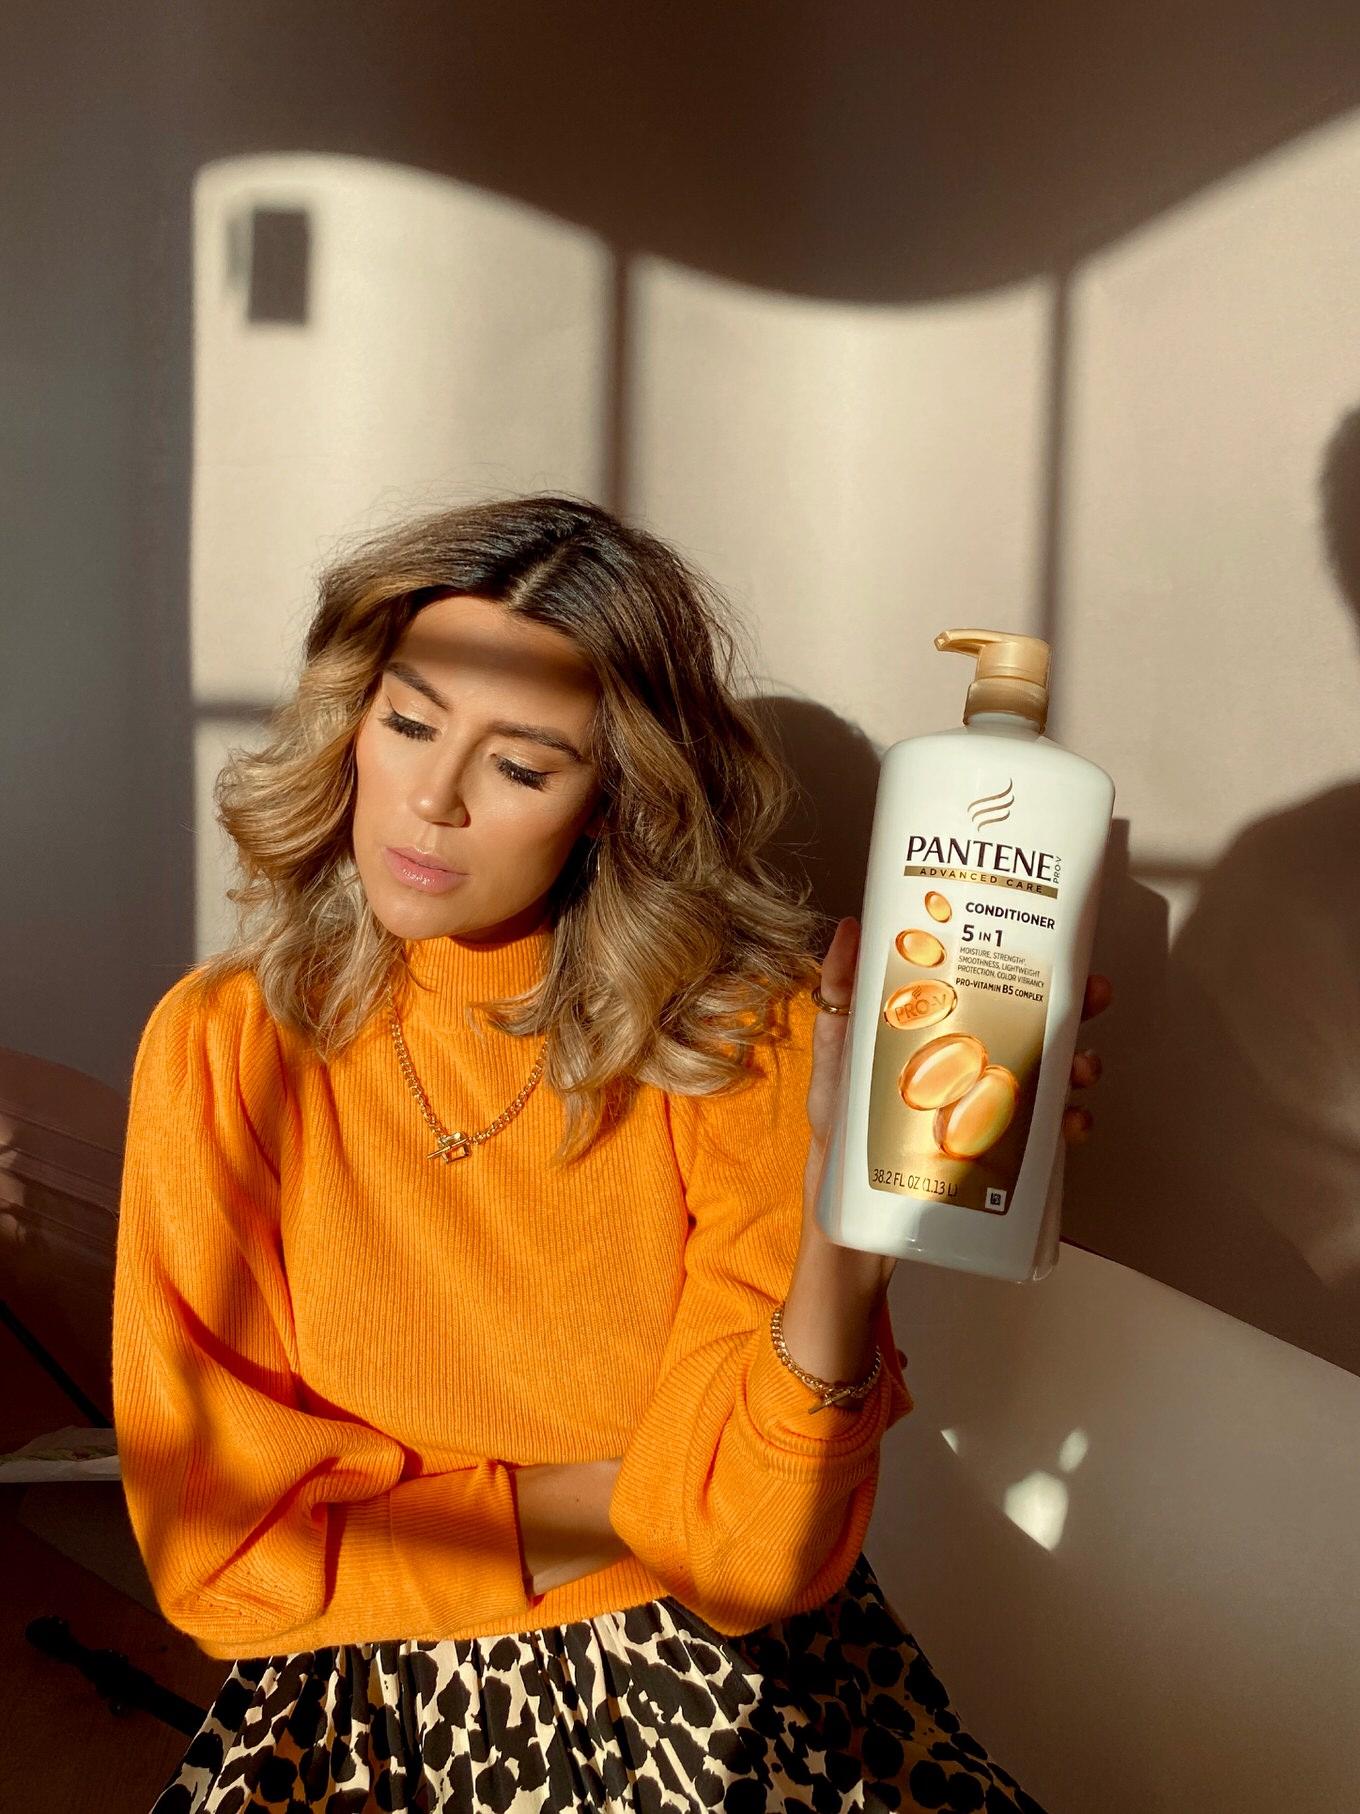 christine andrew in orange sweater holding pantene bottle